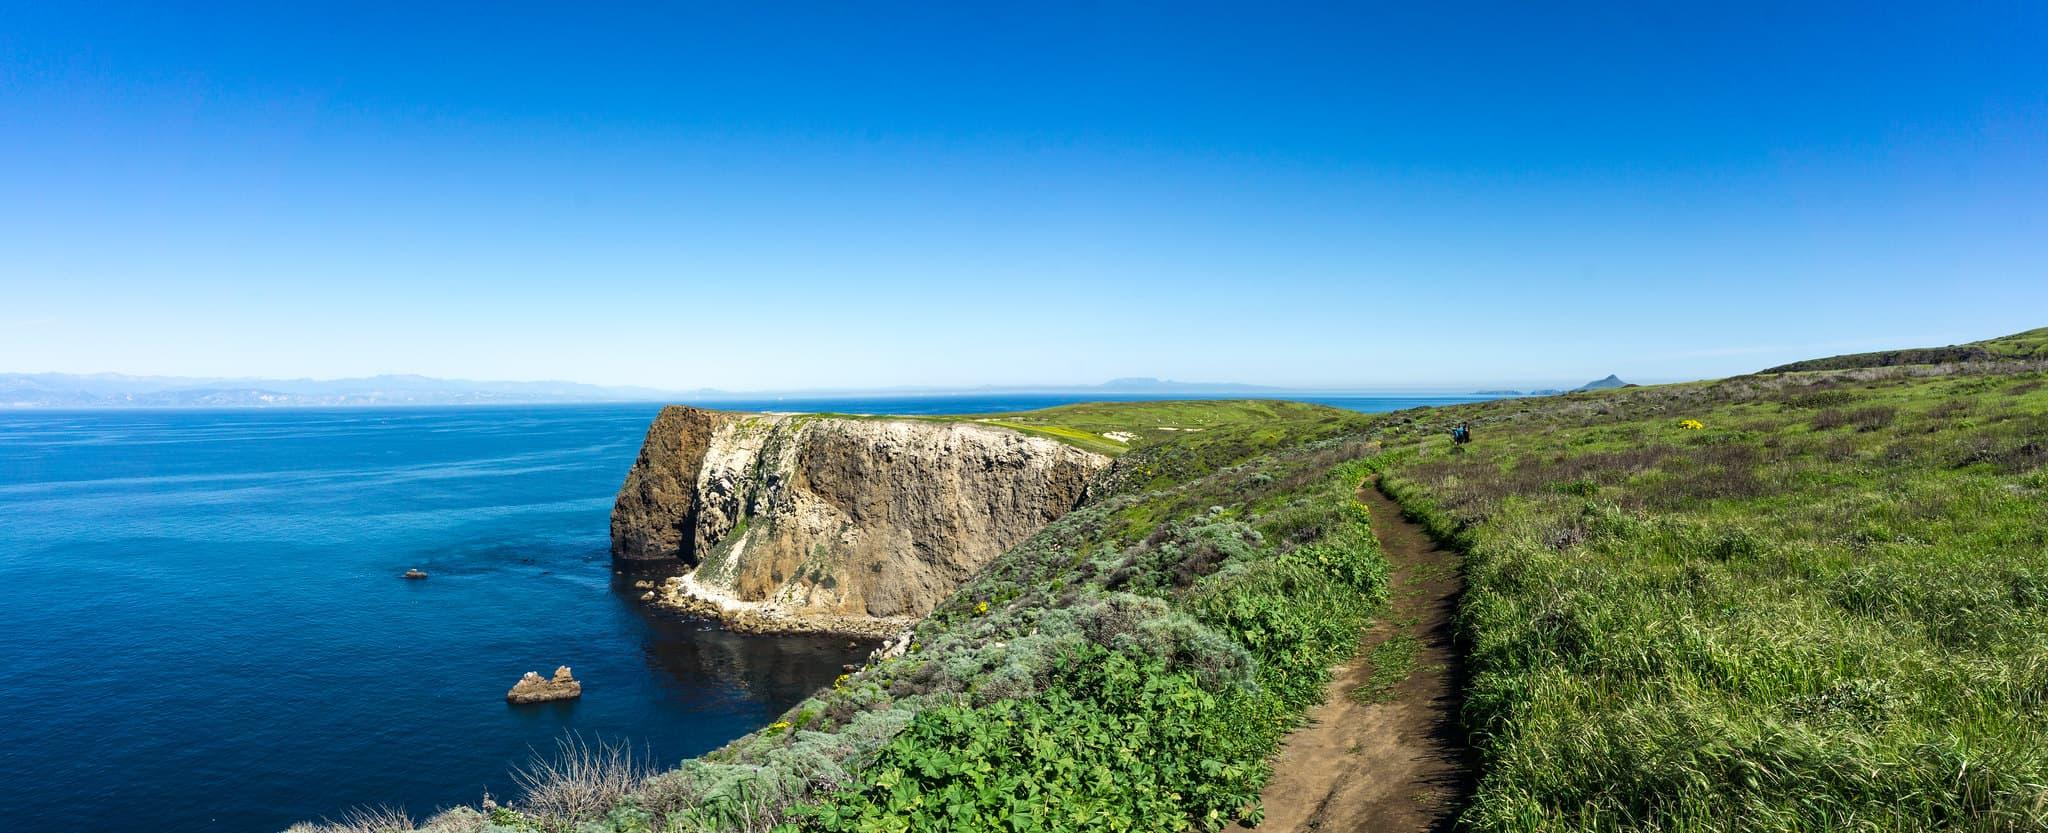 channel islands national park and marine sanctuary ventura